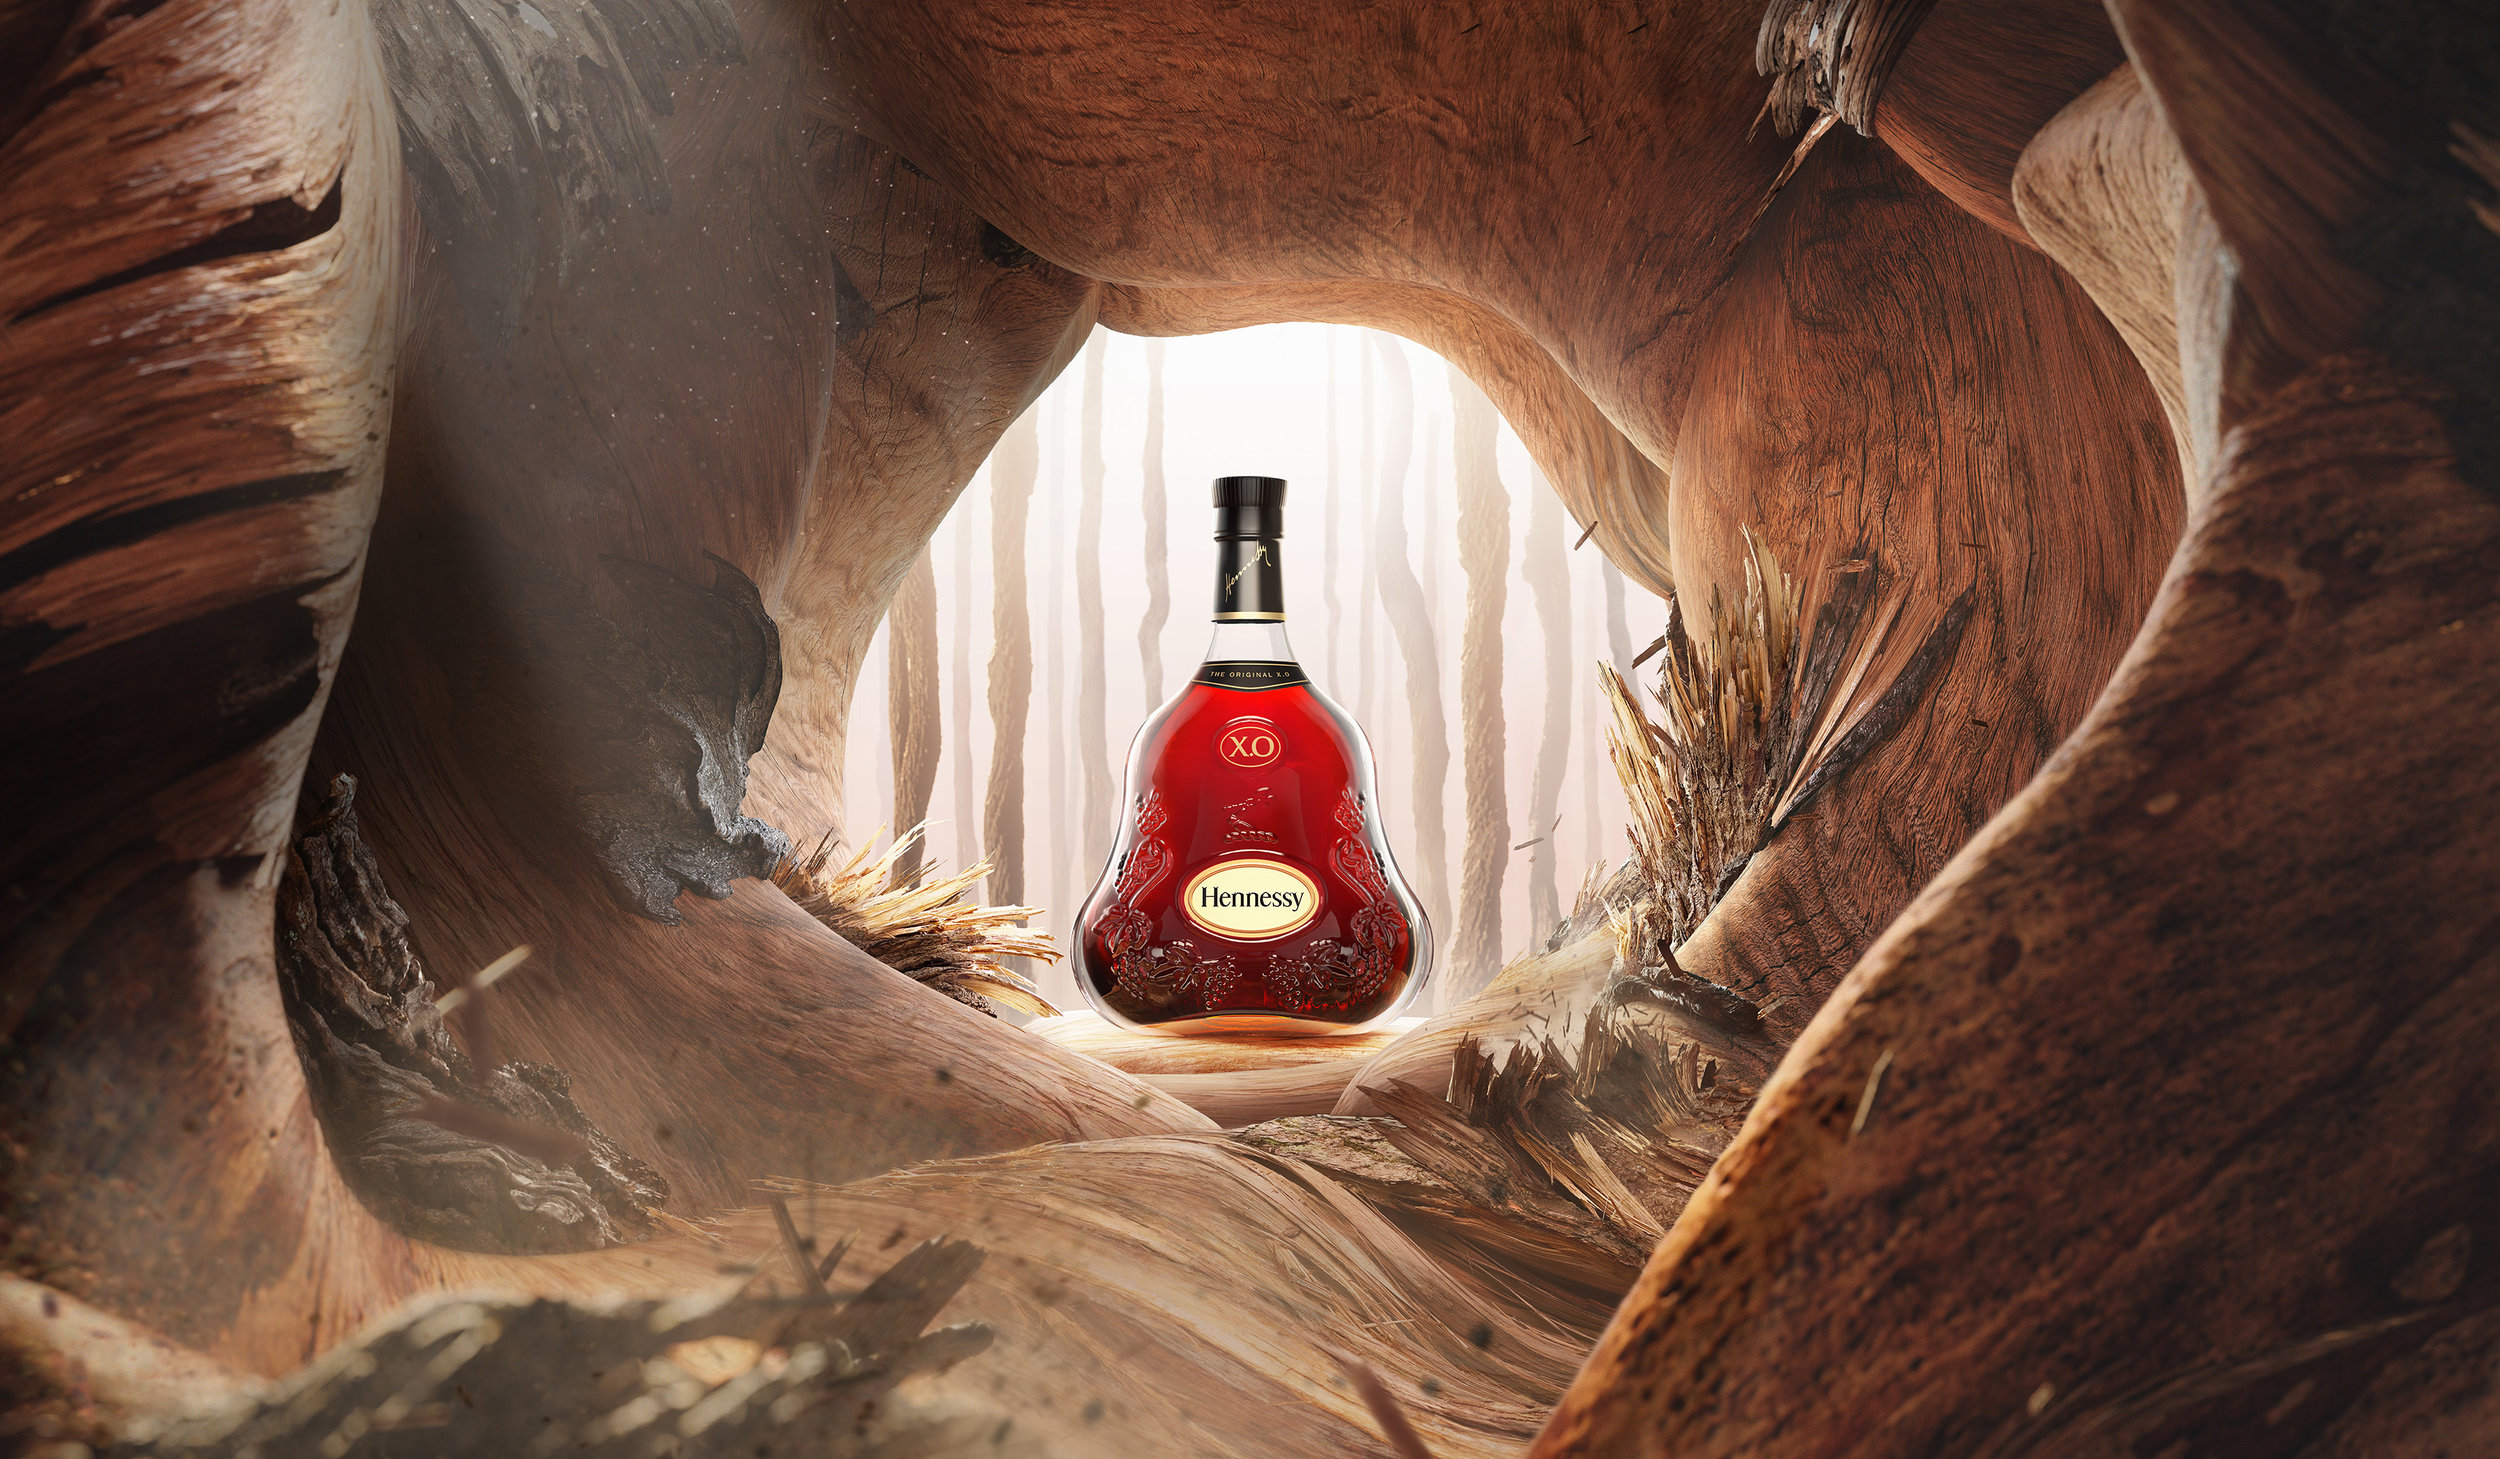 180831_Hennessy_XO_Chapter6_WoodCrunches_DETAIL_28k.jpg